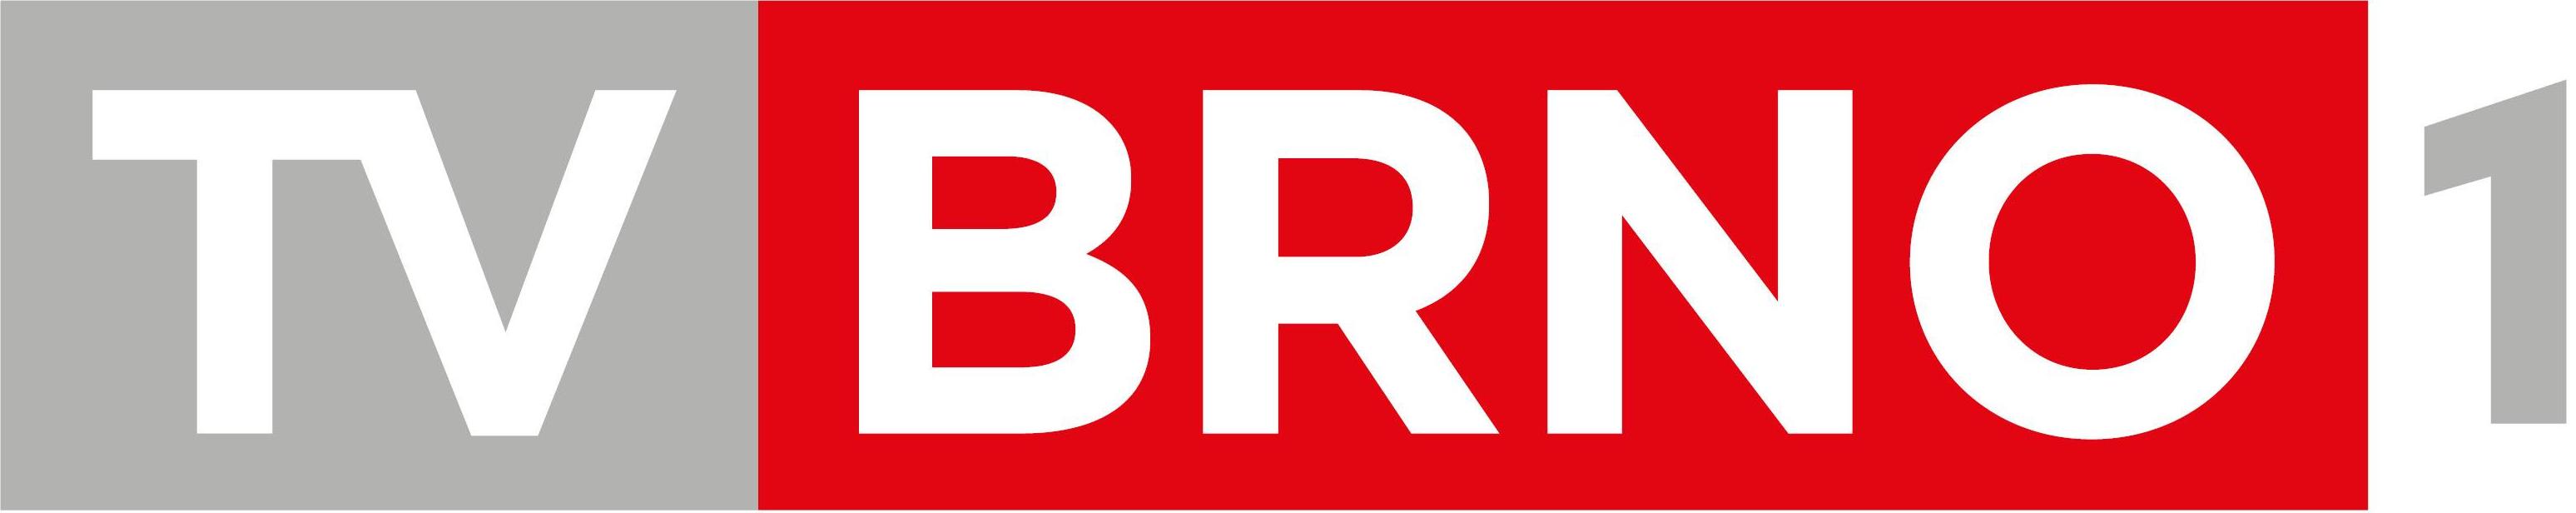 TV Brno